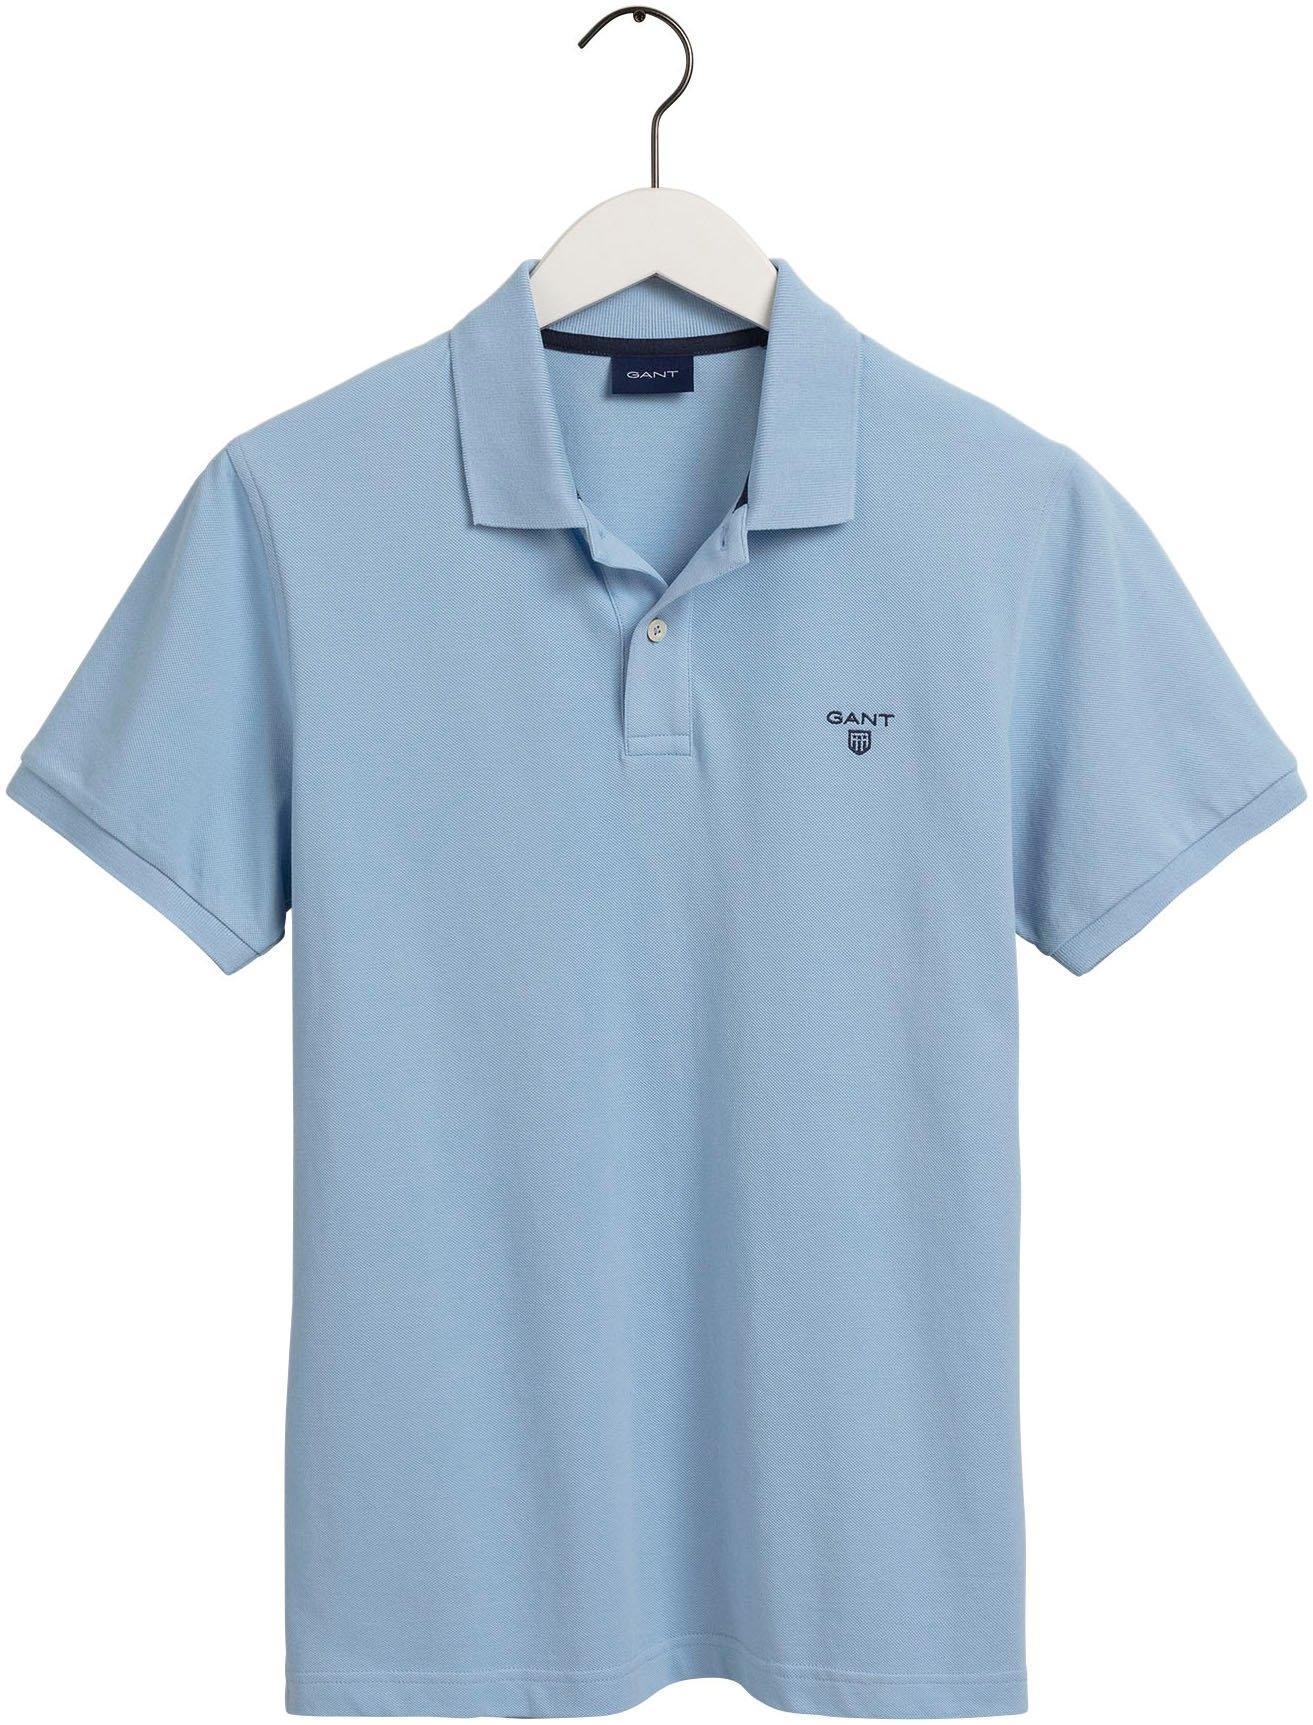 Gant Poloshirt Summer Pique met klein logo bij OTTO online kopen